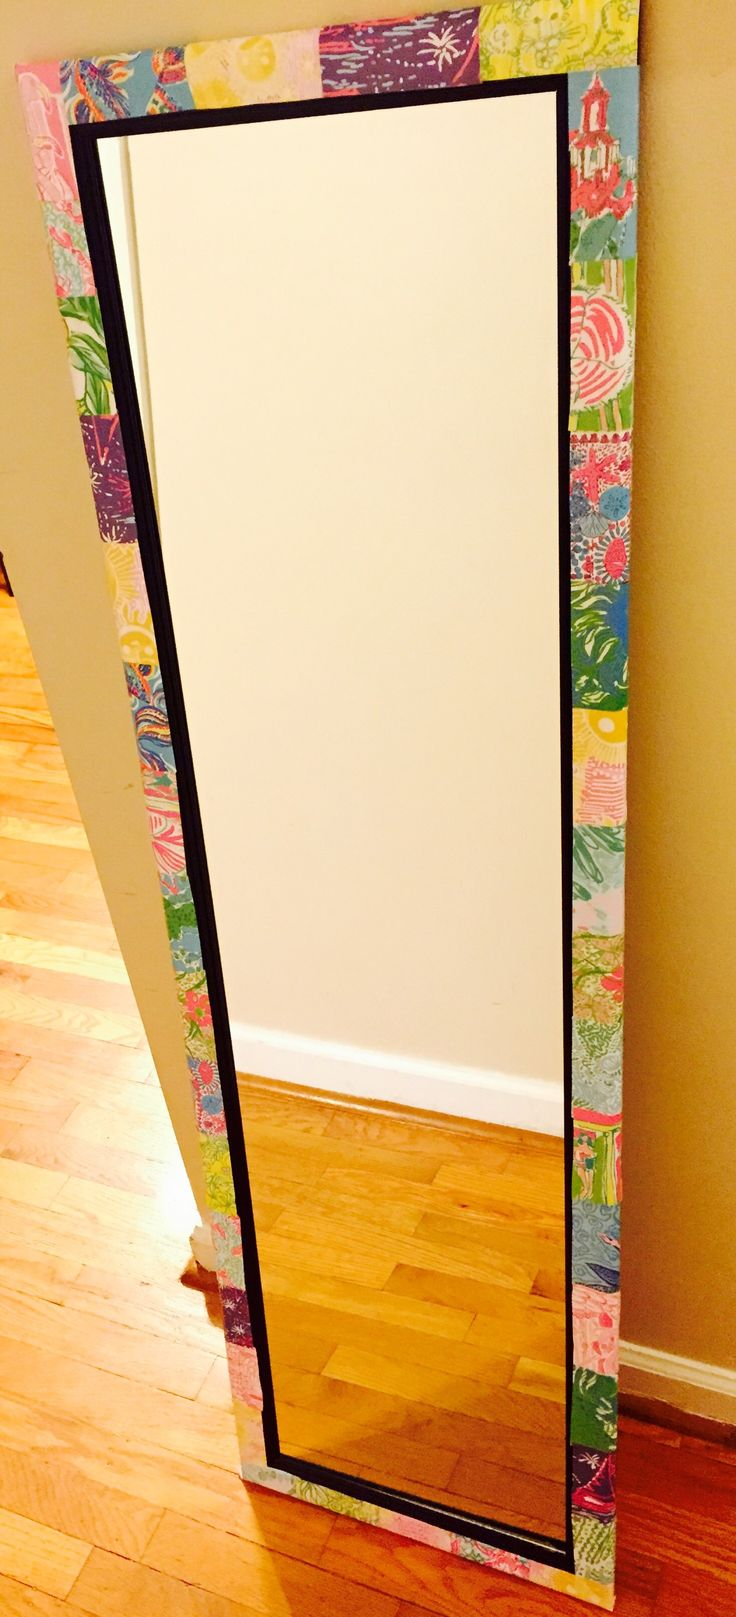 DIY: Lilly Pulitzer mirror | Dorm, Craft and Room